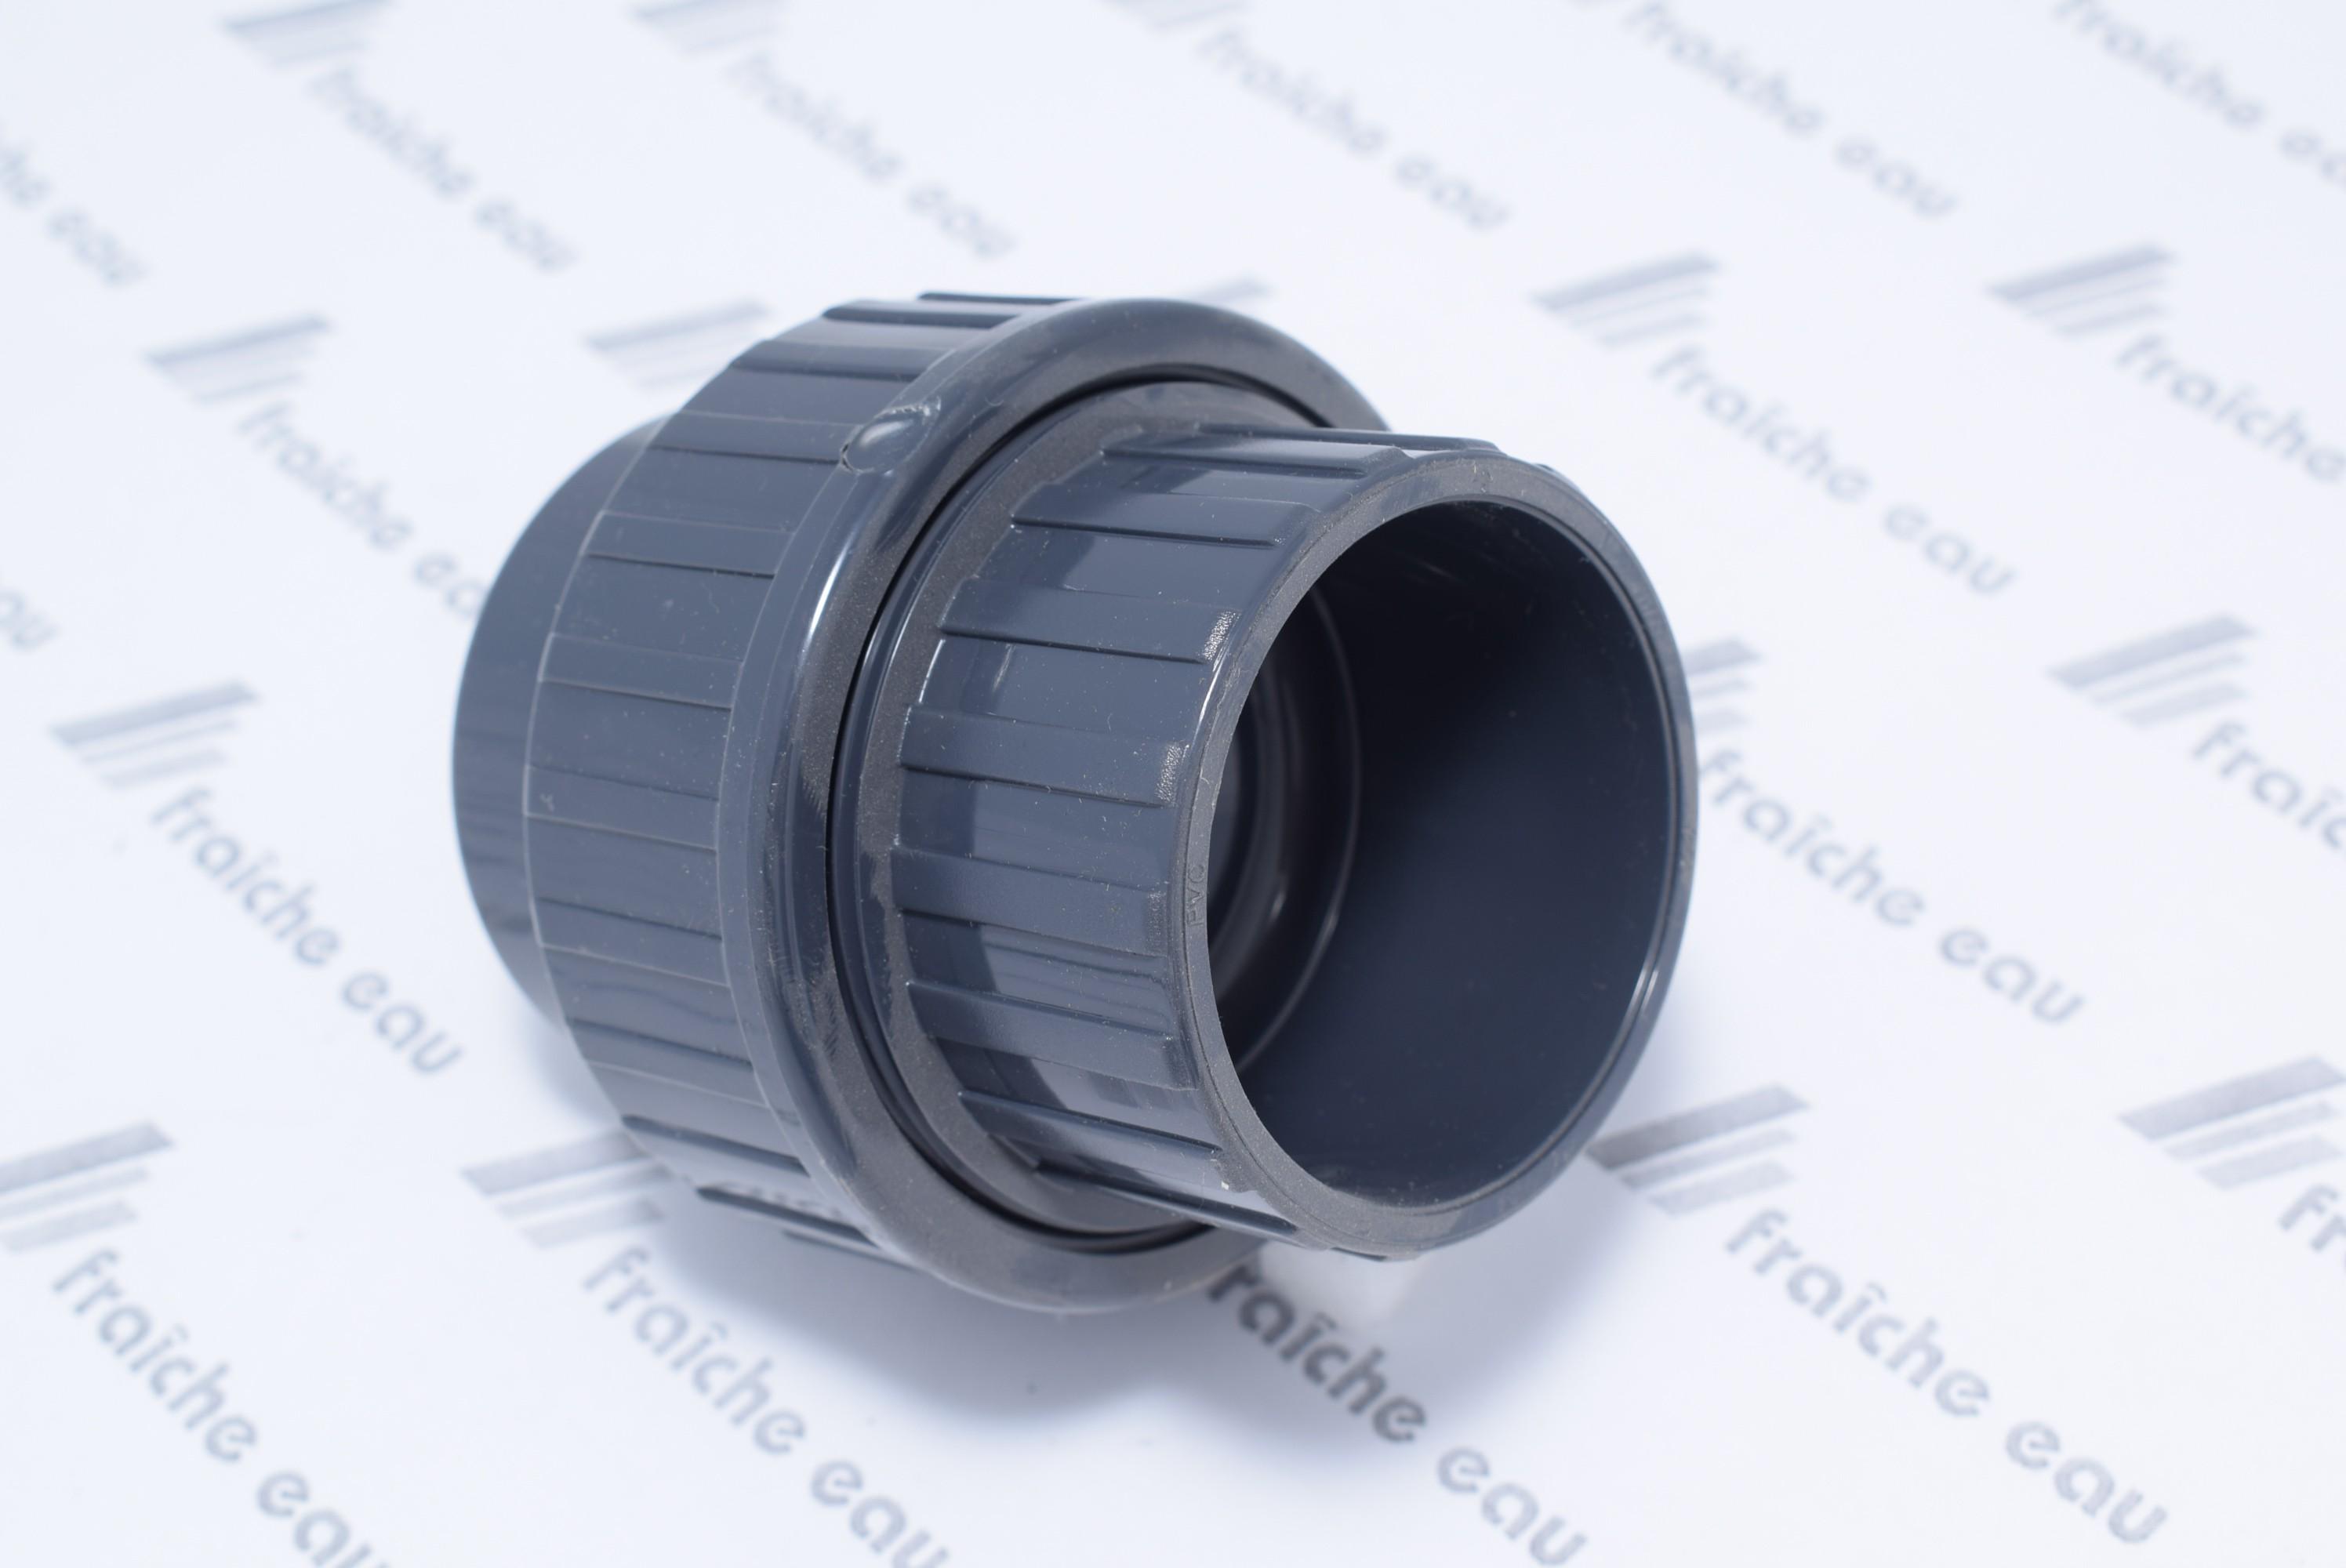 Raccord Union 3 Pieces A Coller Ff Diametre 50 Mm Pvc U Haute